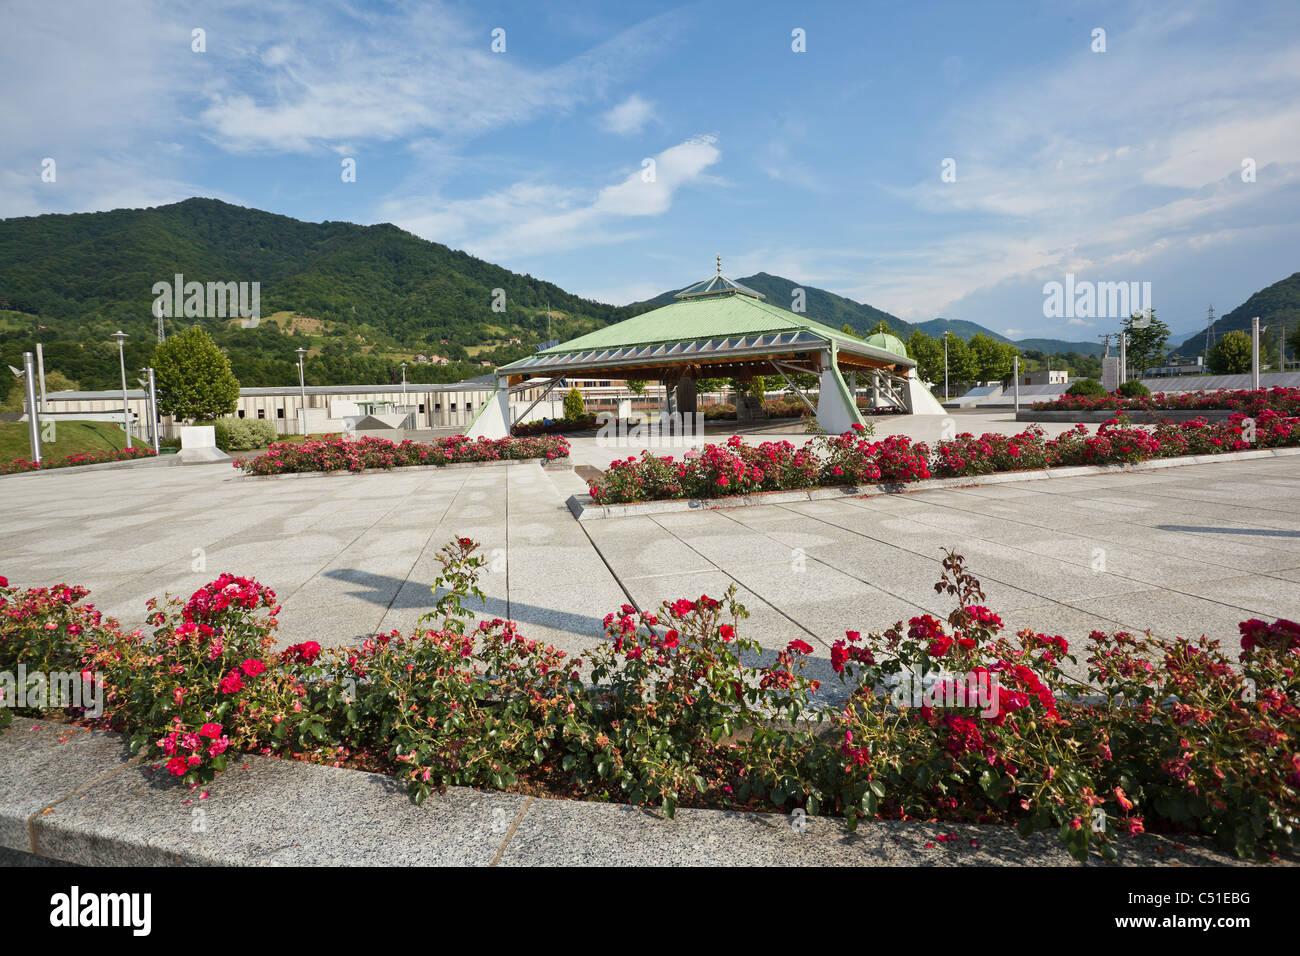 Potocari, Srebrenica, Bosnia and Herzegovina - Stock Image